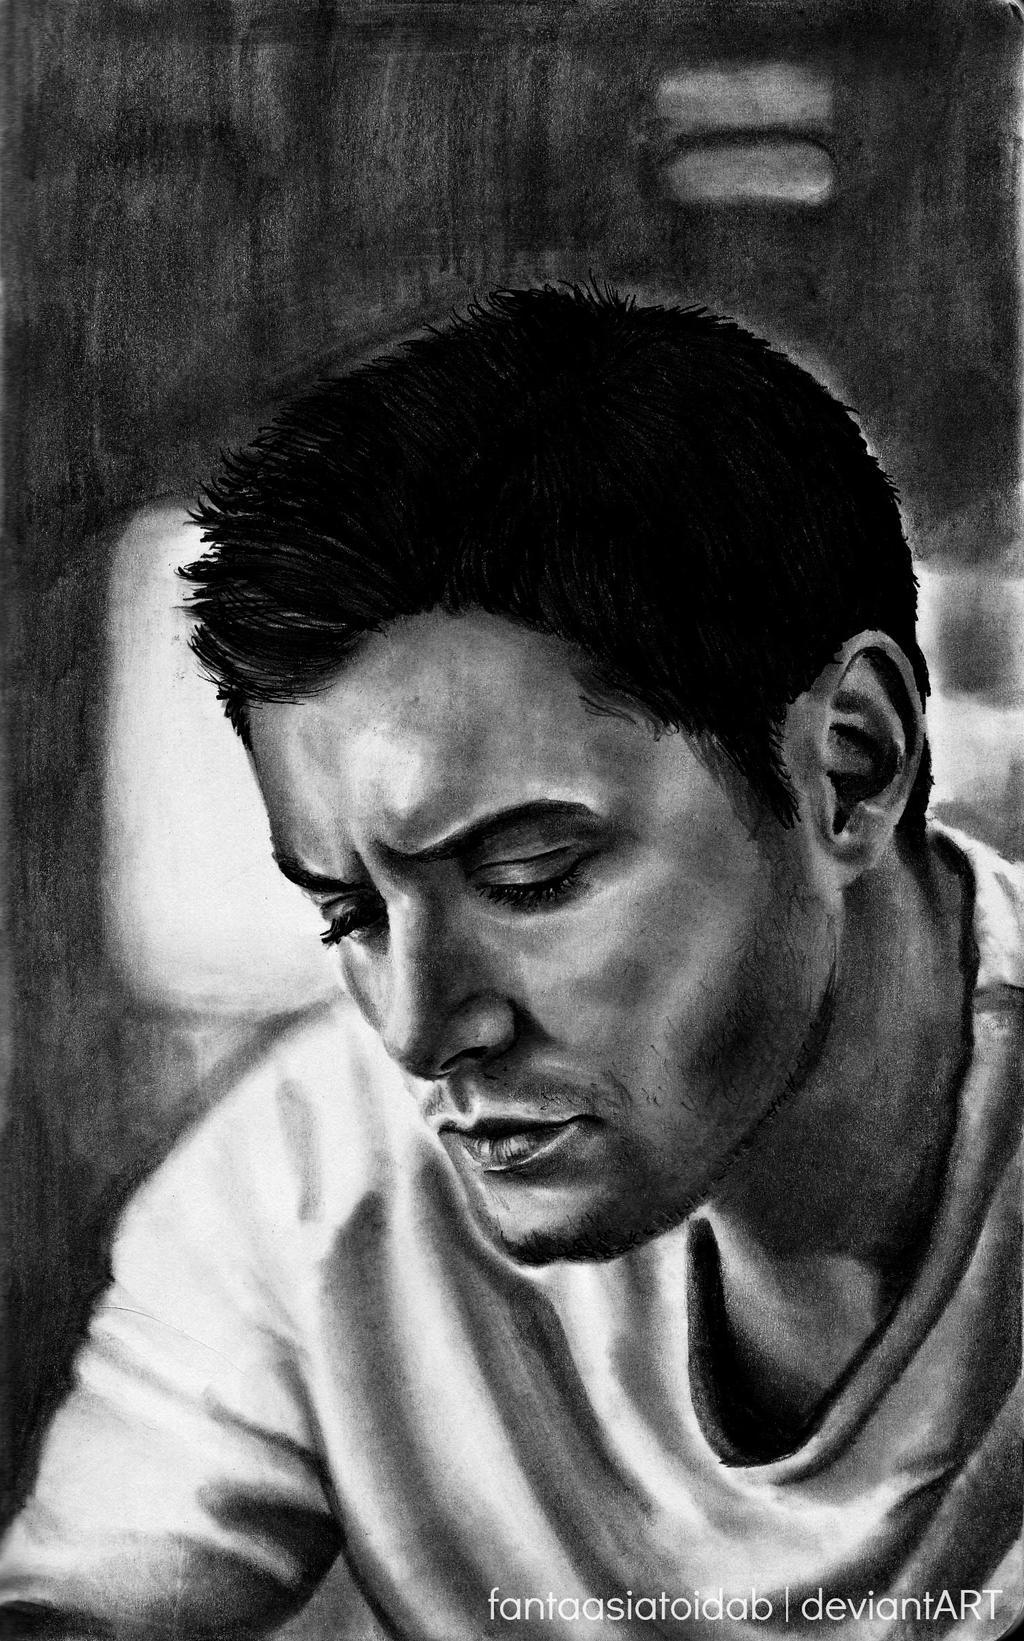 Sketch 2 Jensen Ackles by Fantaasiatoidab